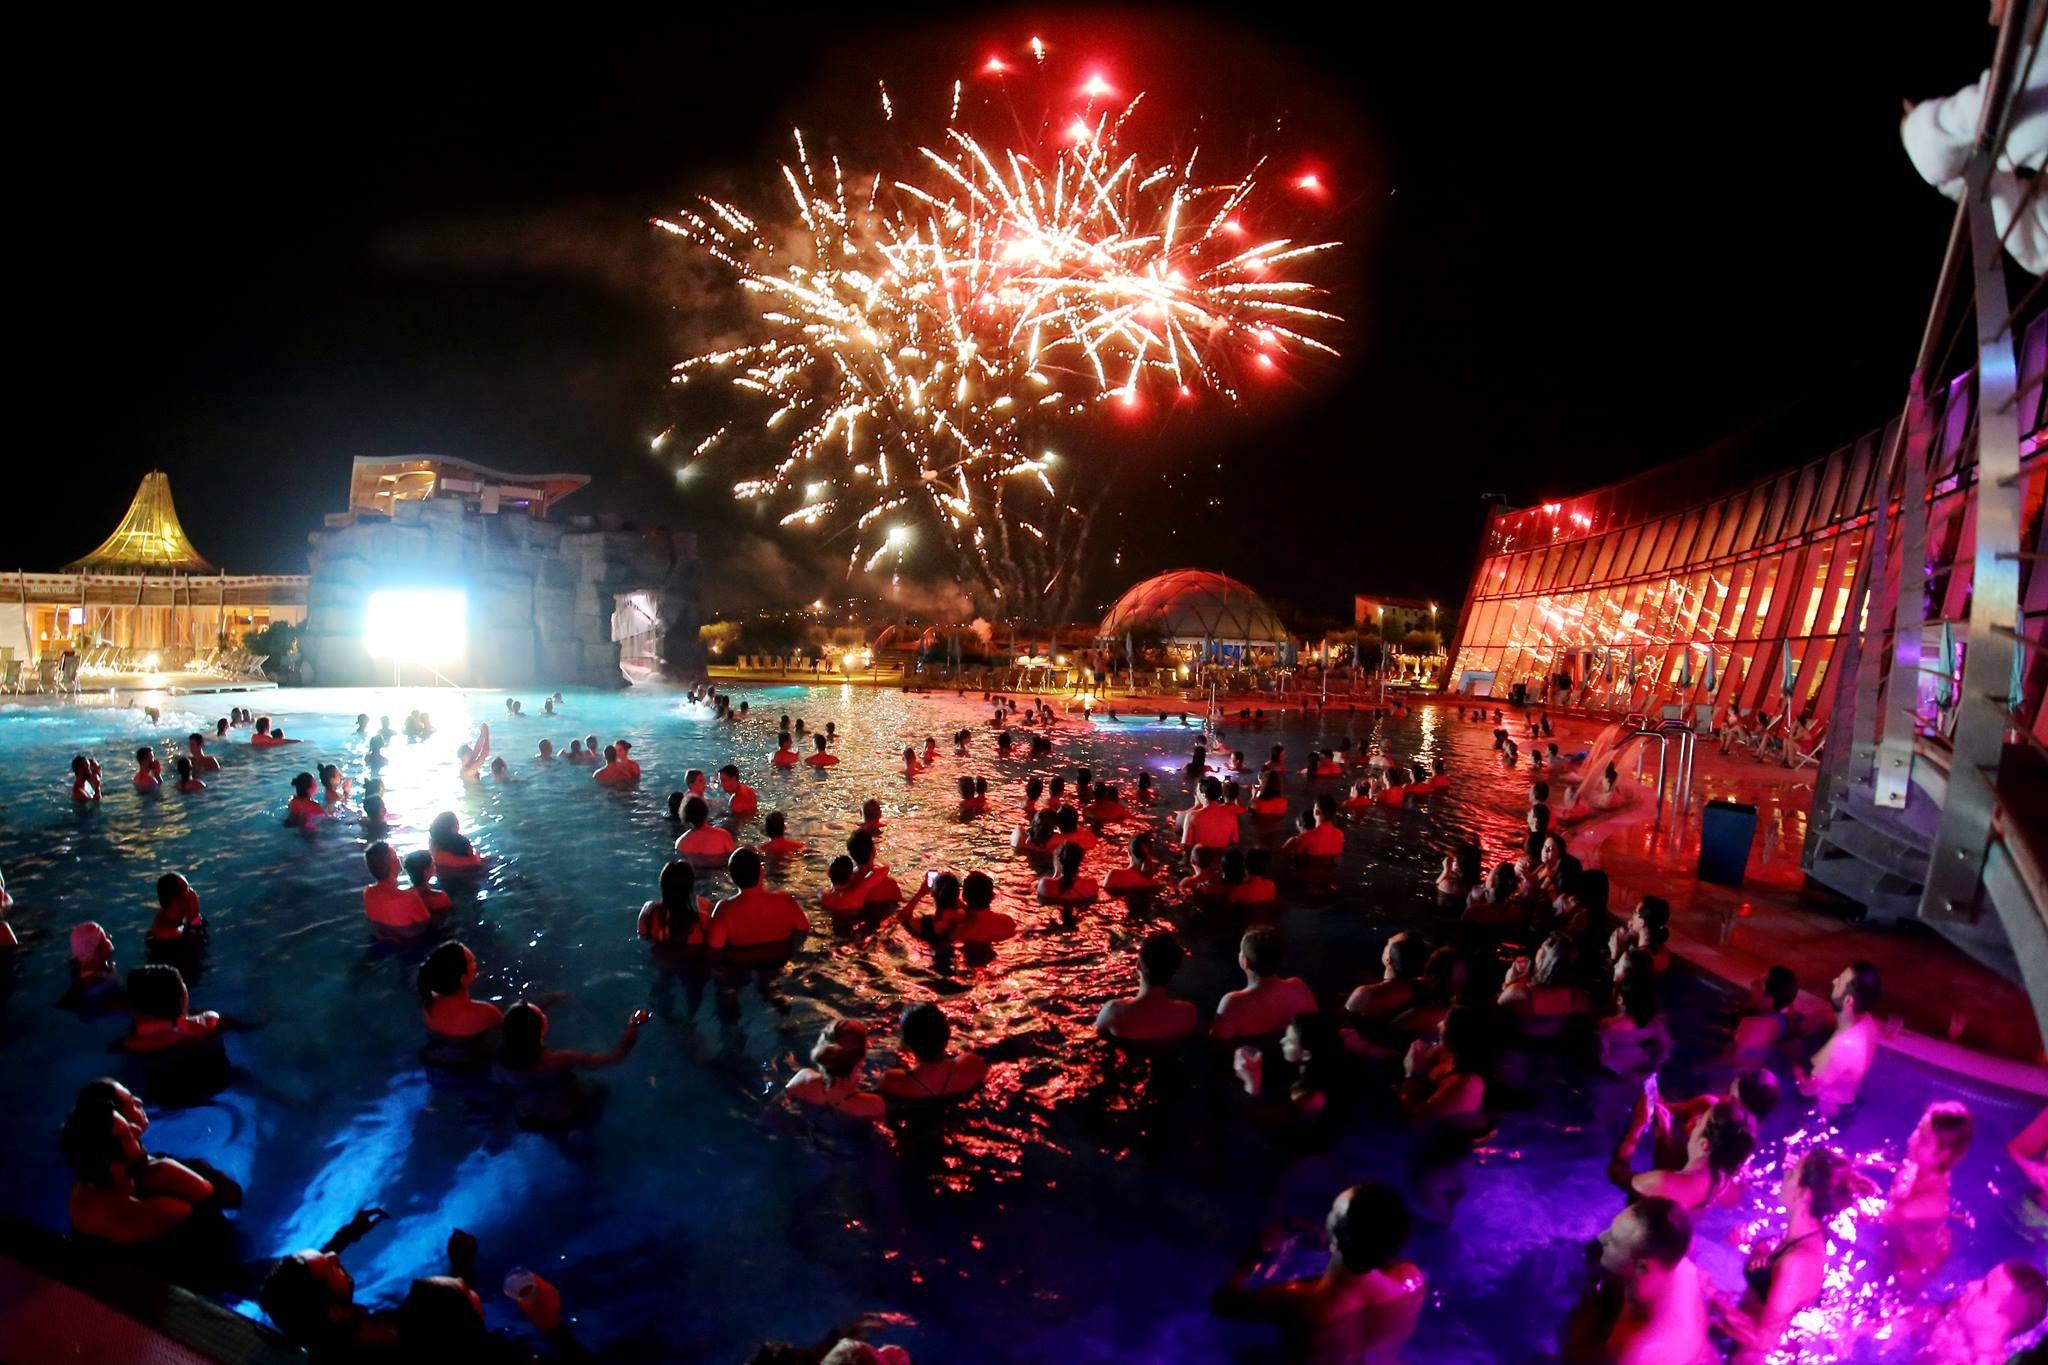 21 June Aquardens Pescantina Pool Party Fireworks Dj Set Miami Night Evento Miami Verona